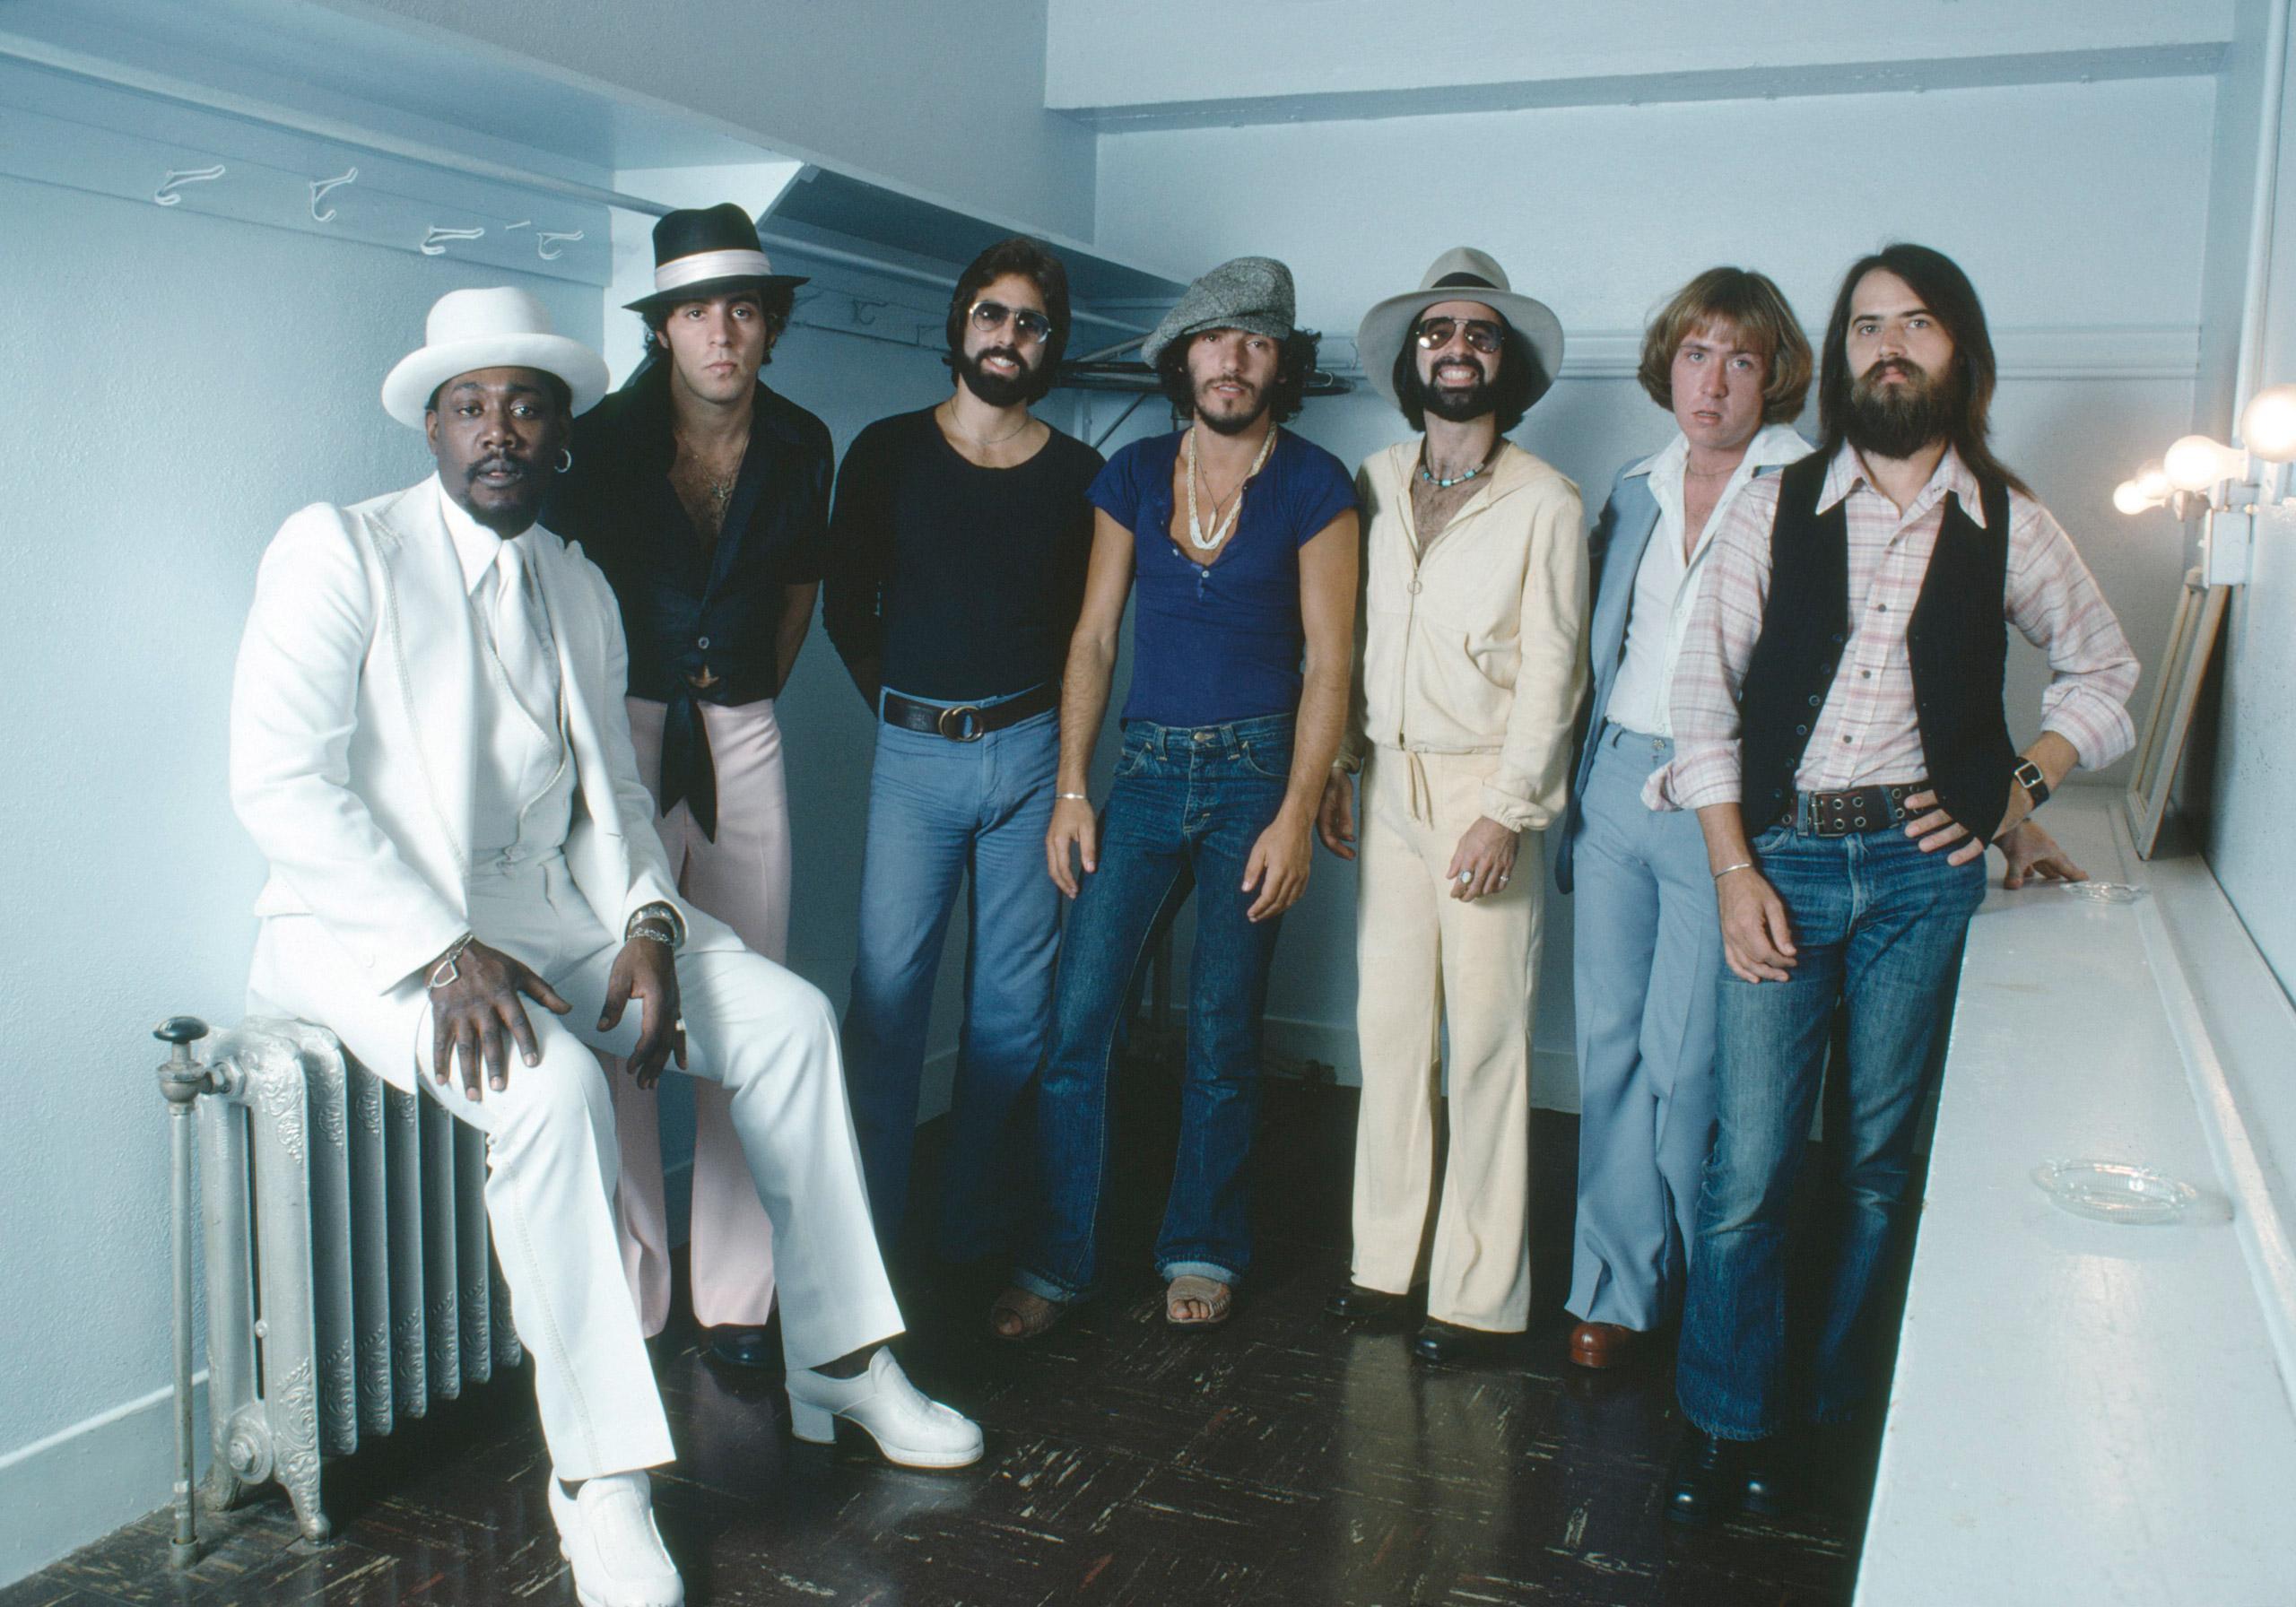 Bruce Springsteen E Street Band - Photo Barbara Pyle